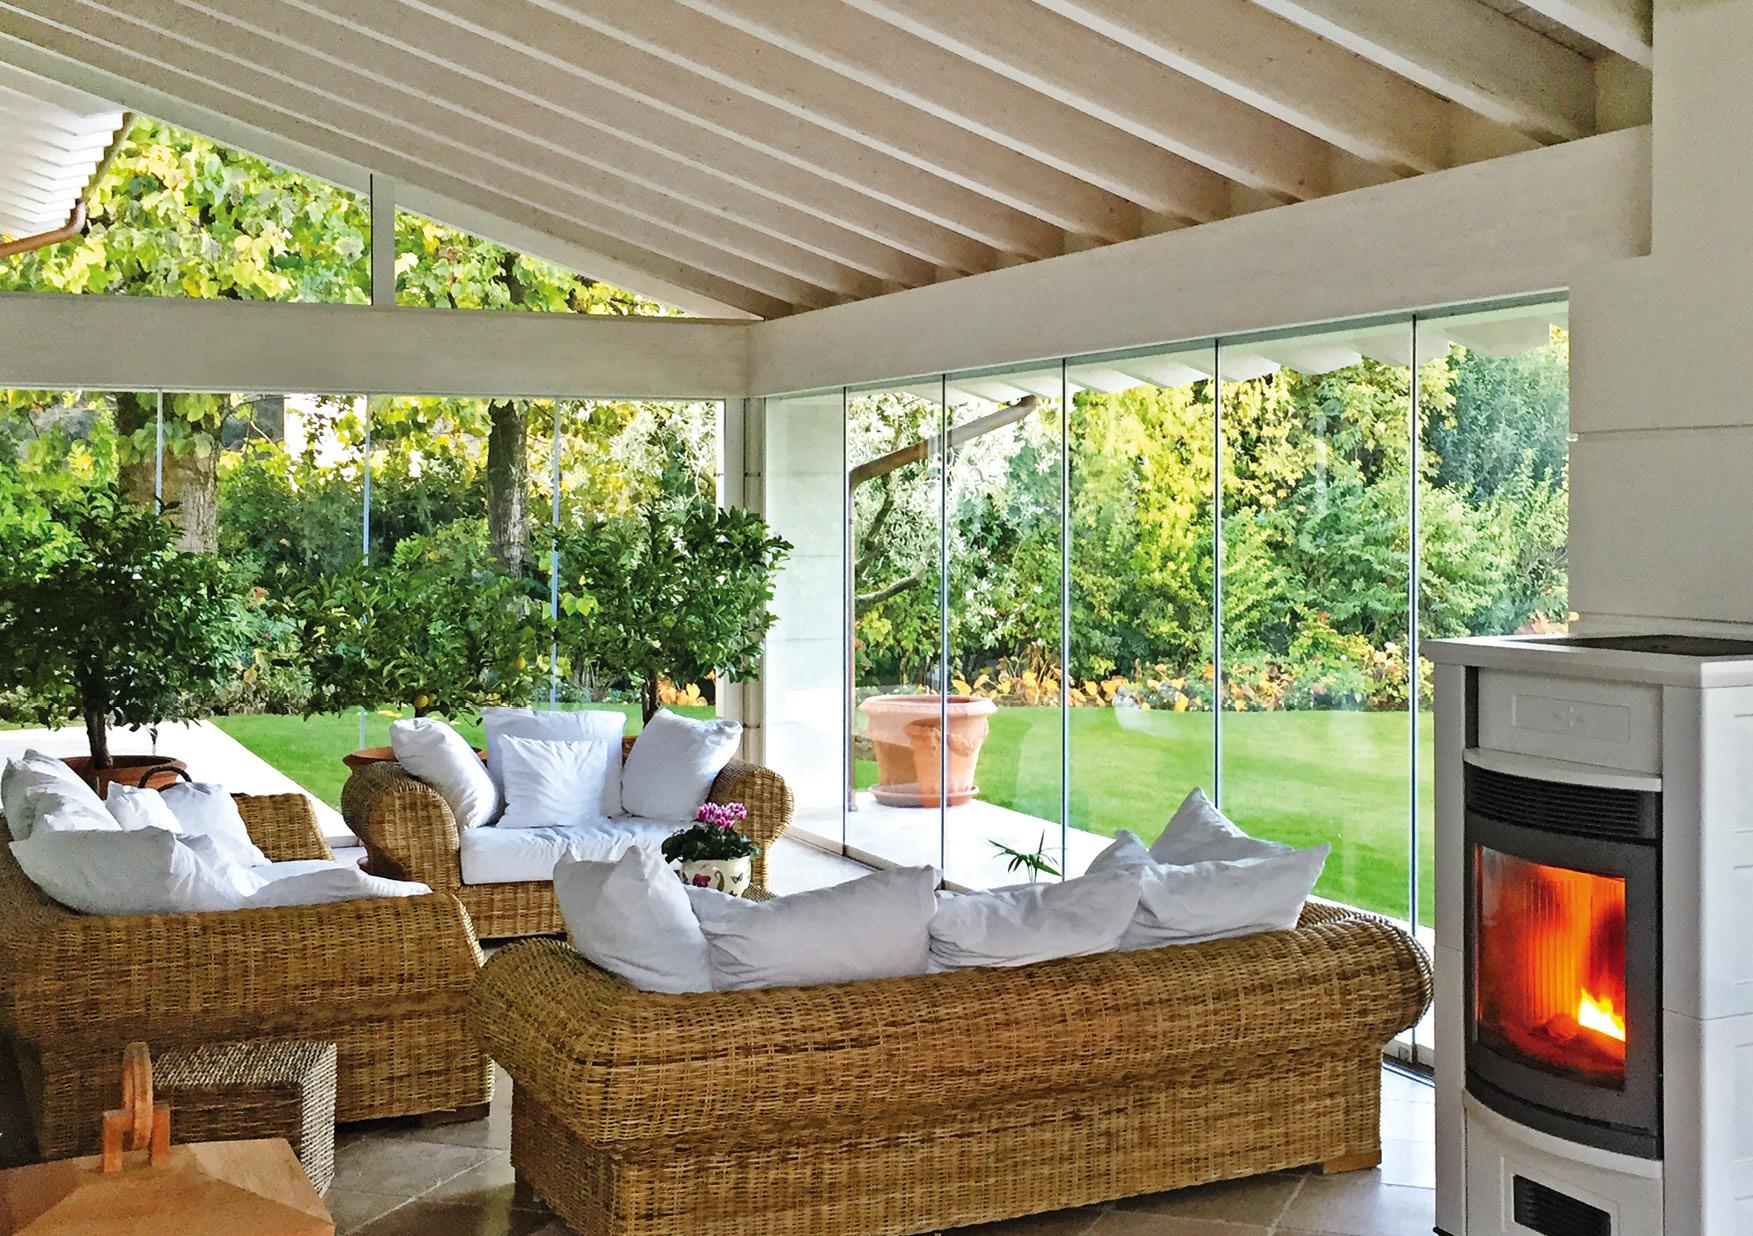 indoor sistema vetro per veranda esterna